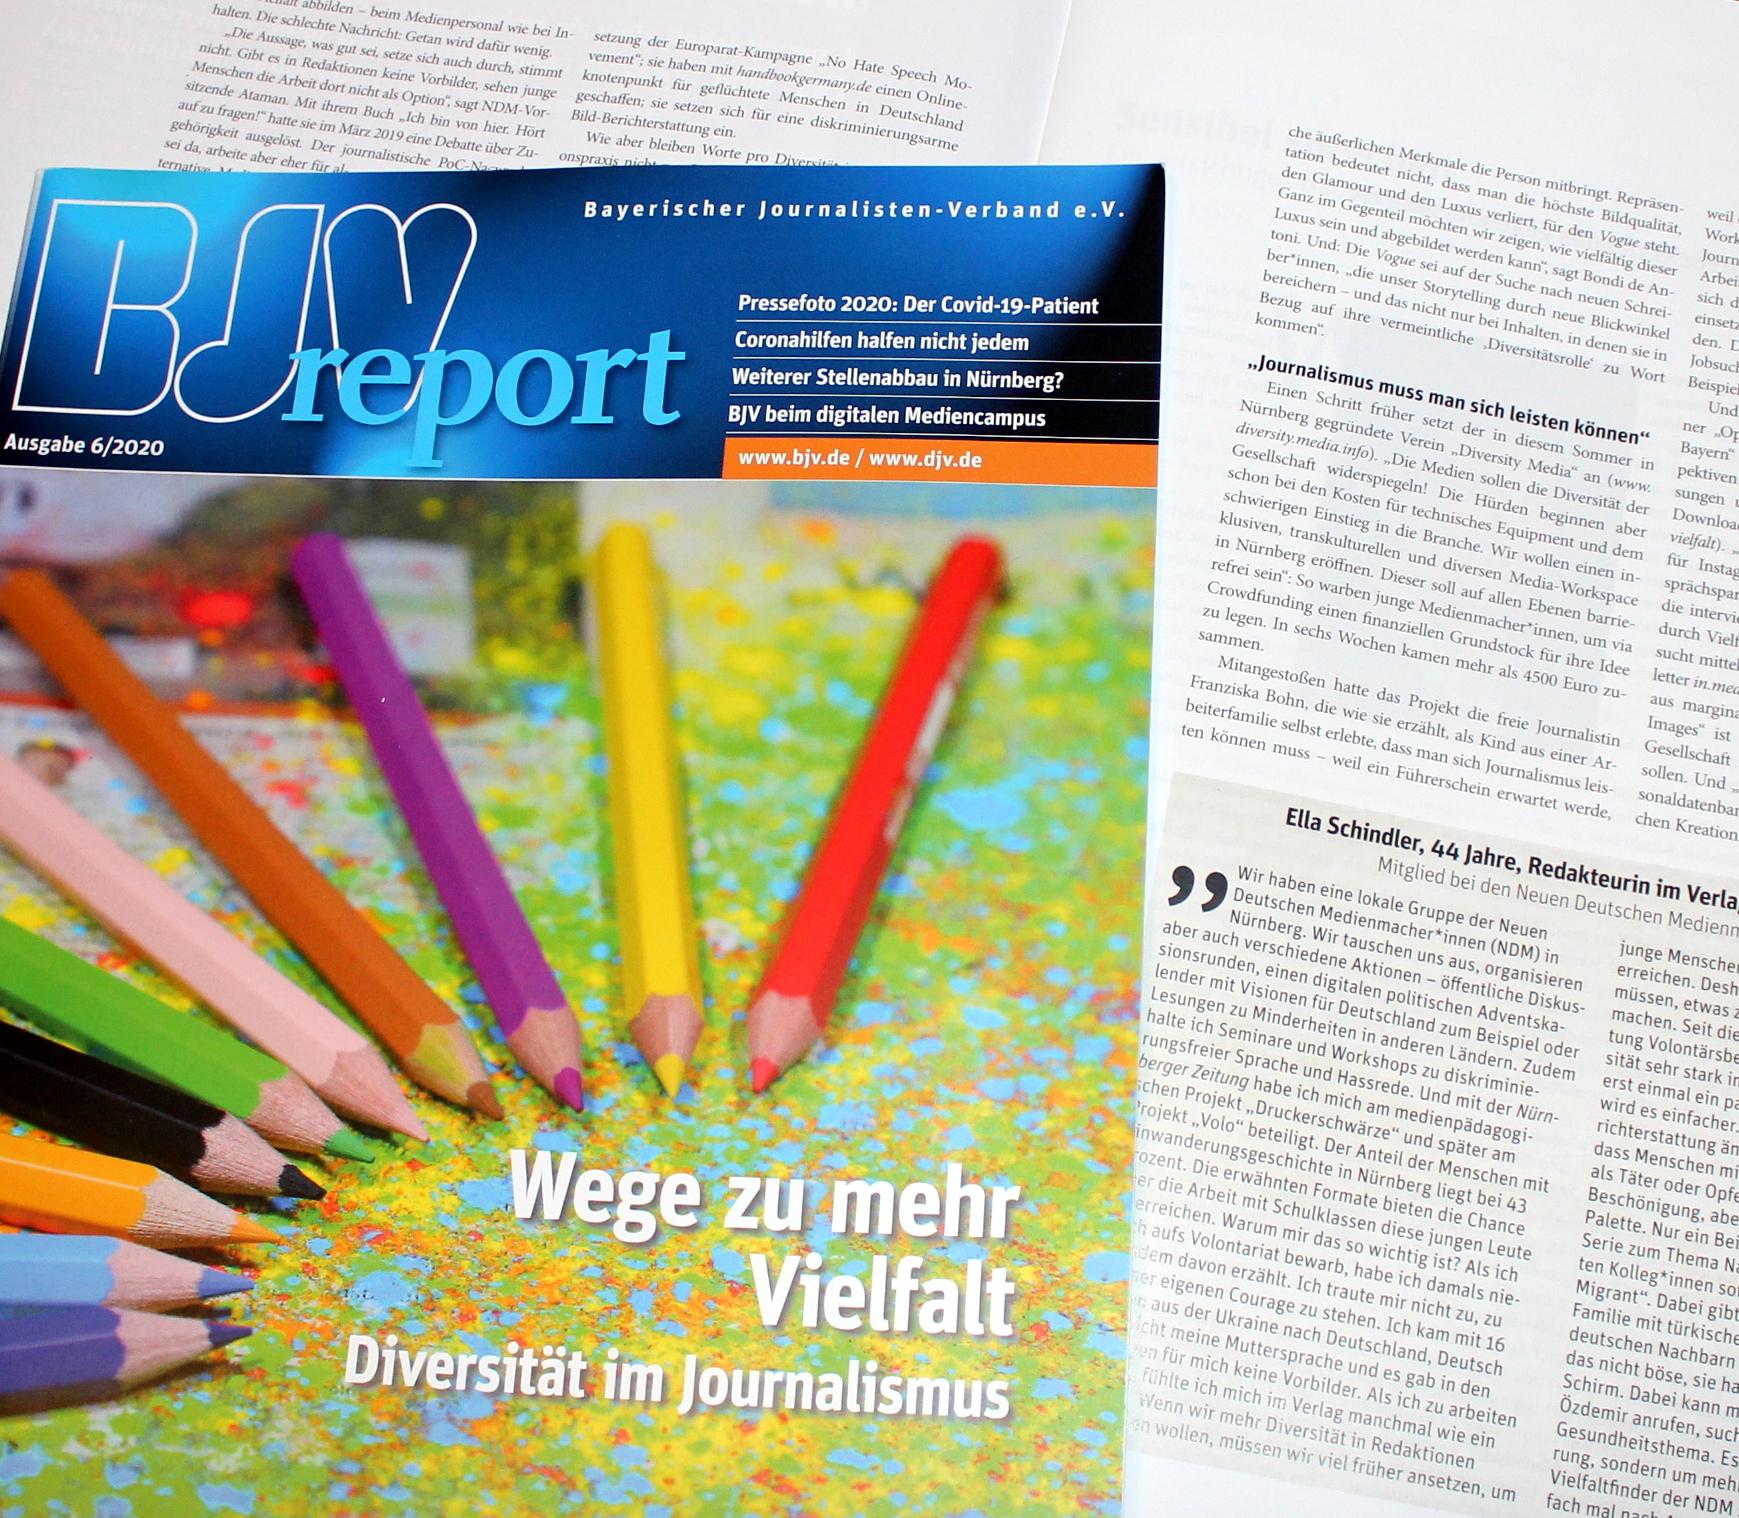 Interviews mit Diversity Media